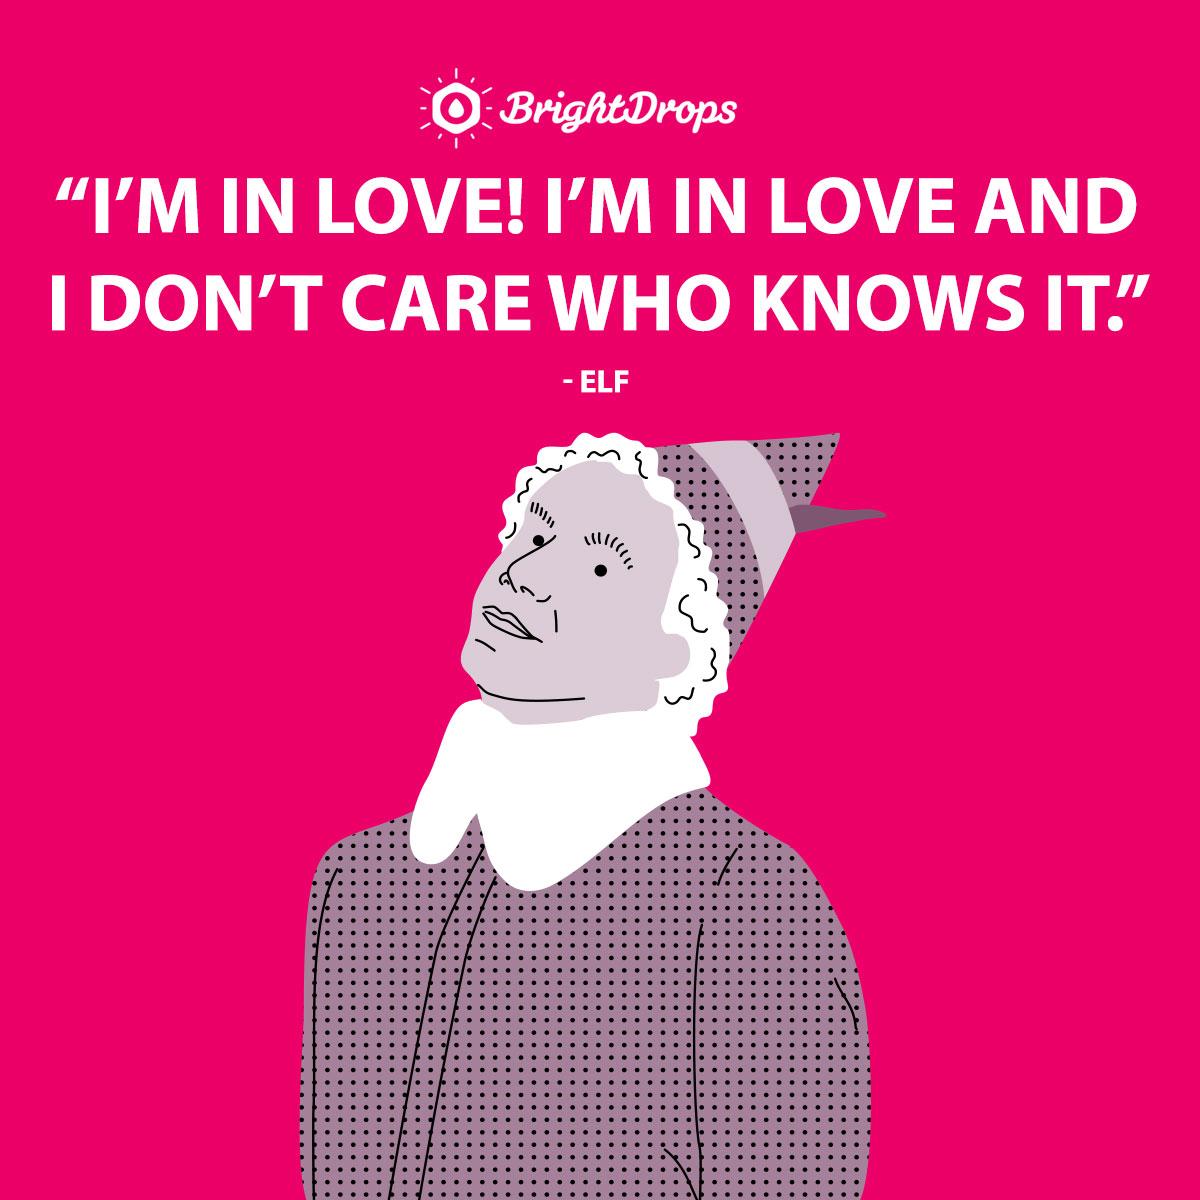 I'm in love! I'm in love and I don't care who knows it. - Elf